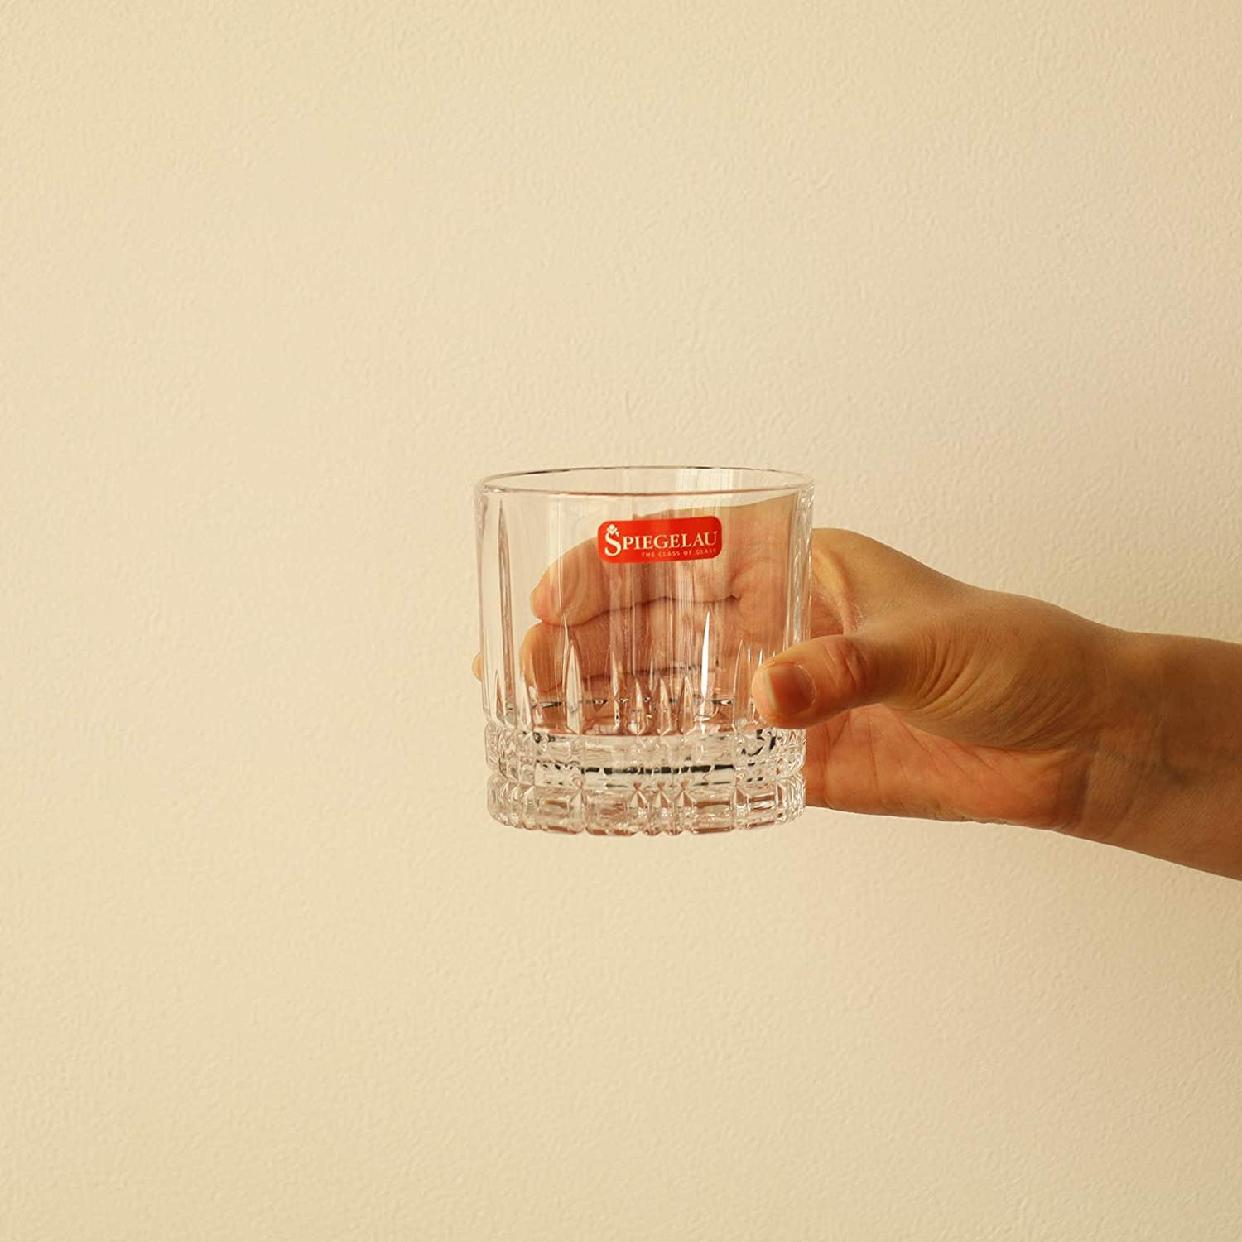 ADERIA(アデリア) ロックグラス クリア 270ml J-4064の商品画像5